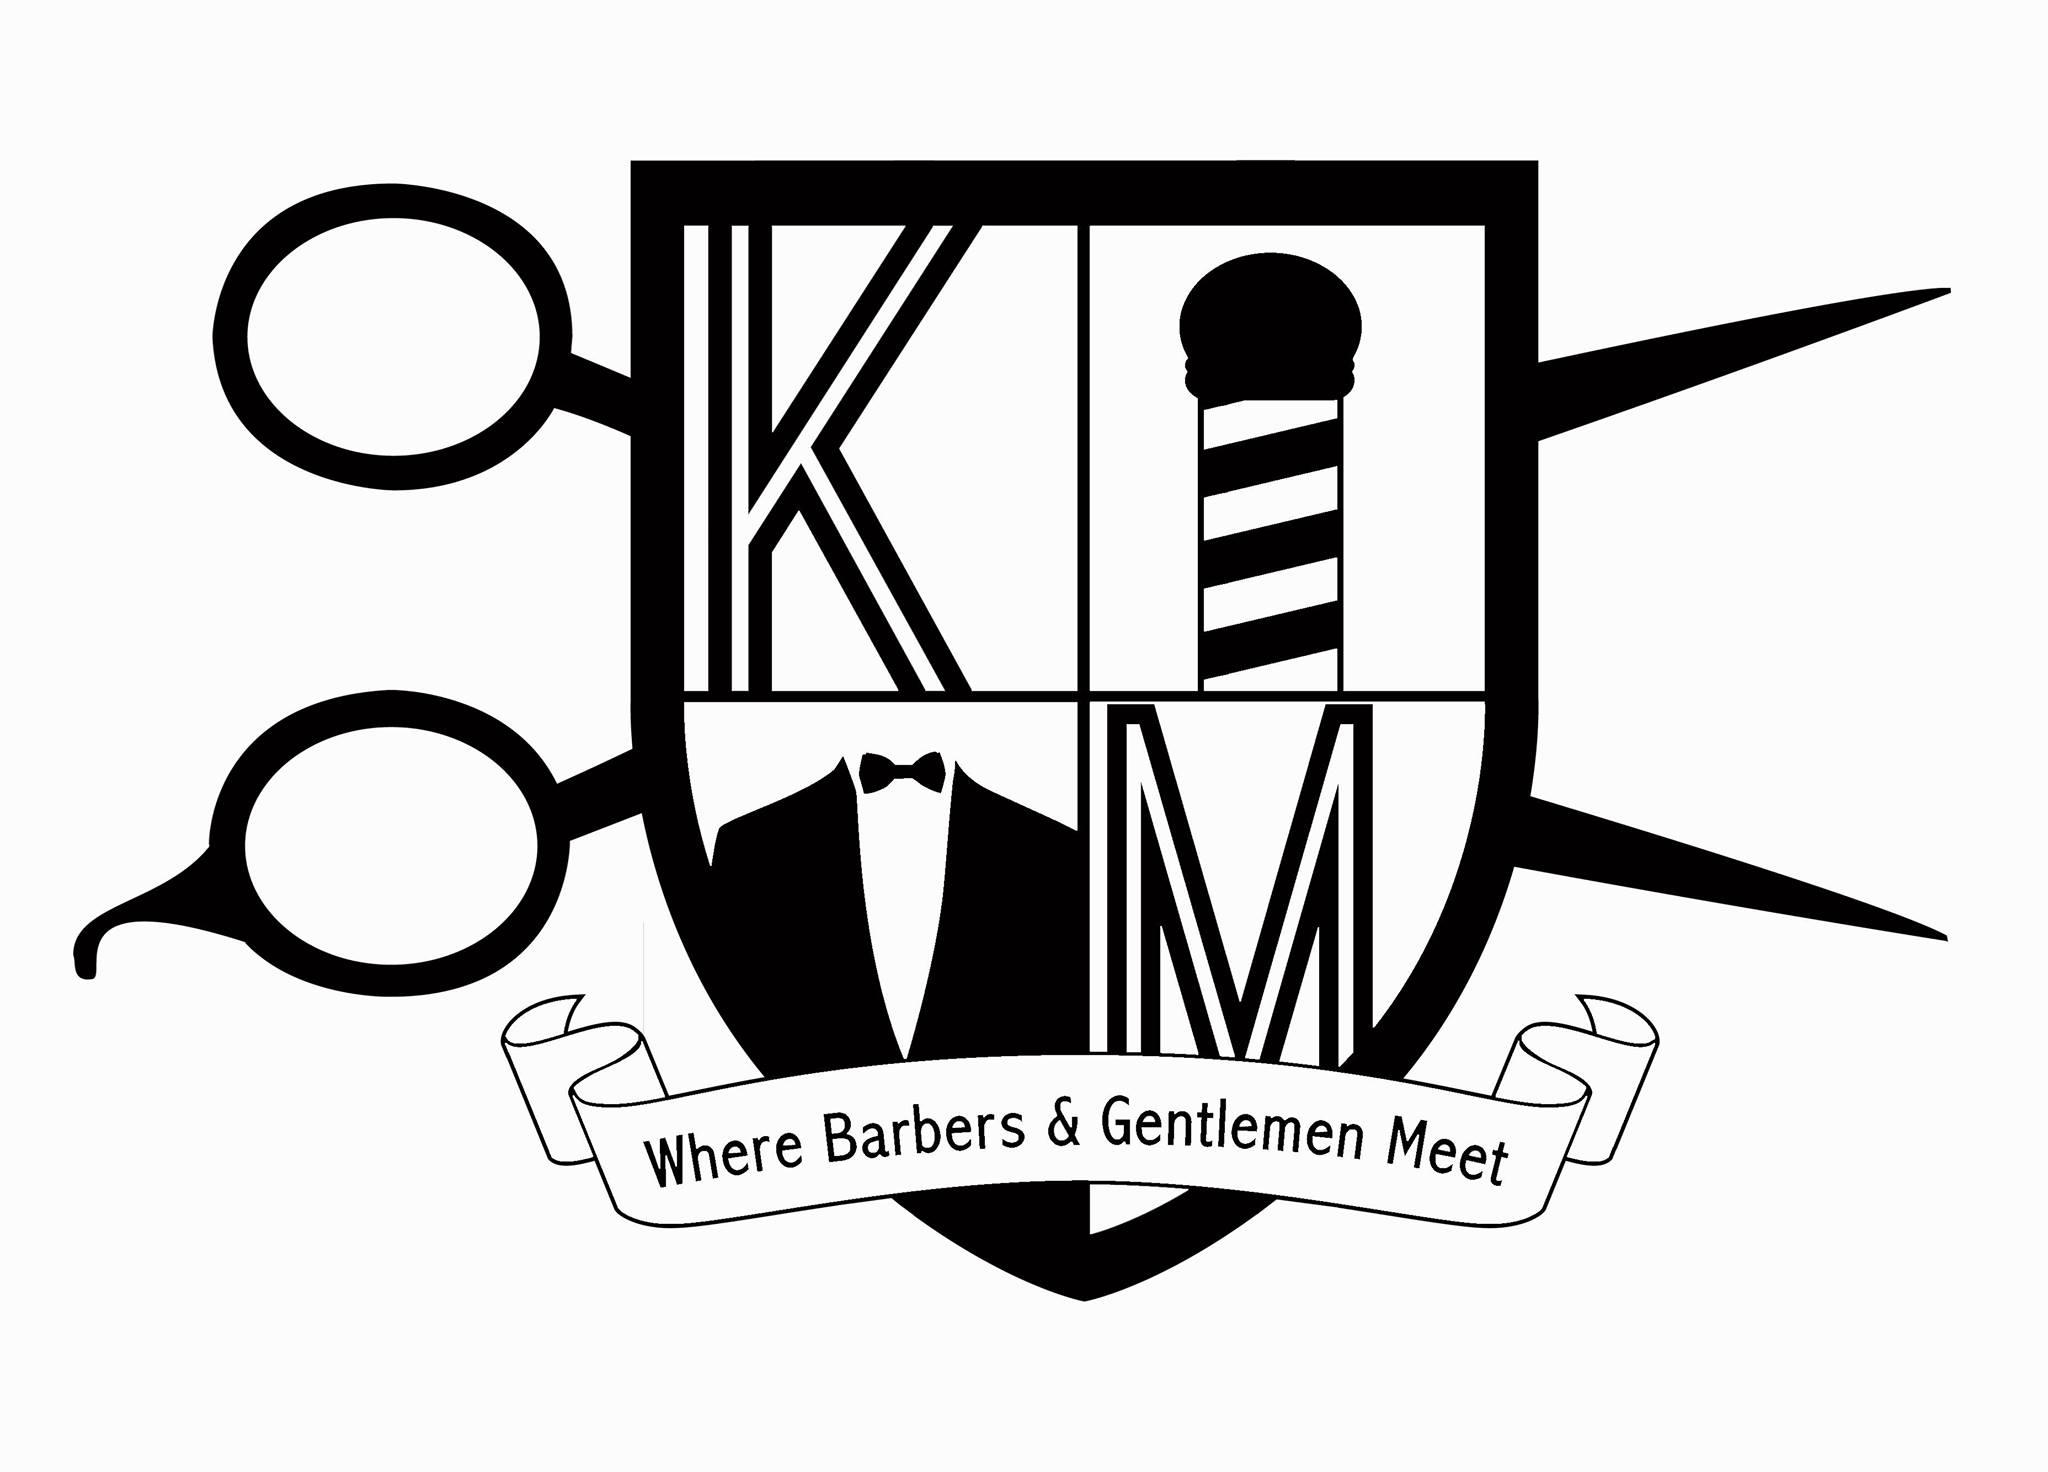 Kenny Mac's Barbershop